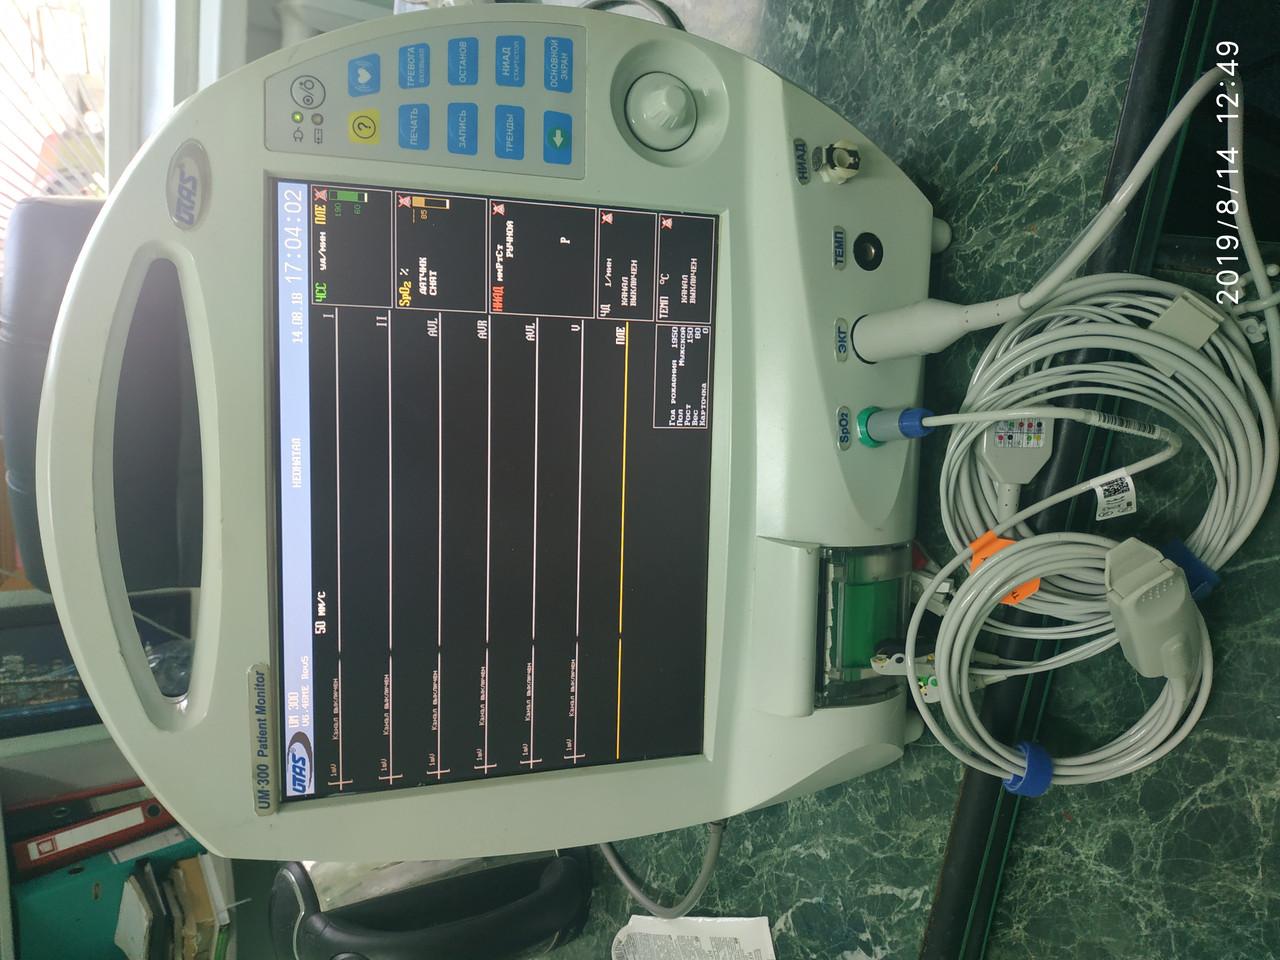 Pеанимационно-хирургический монитор ЮМ-300 Б/У